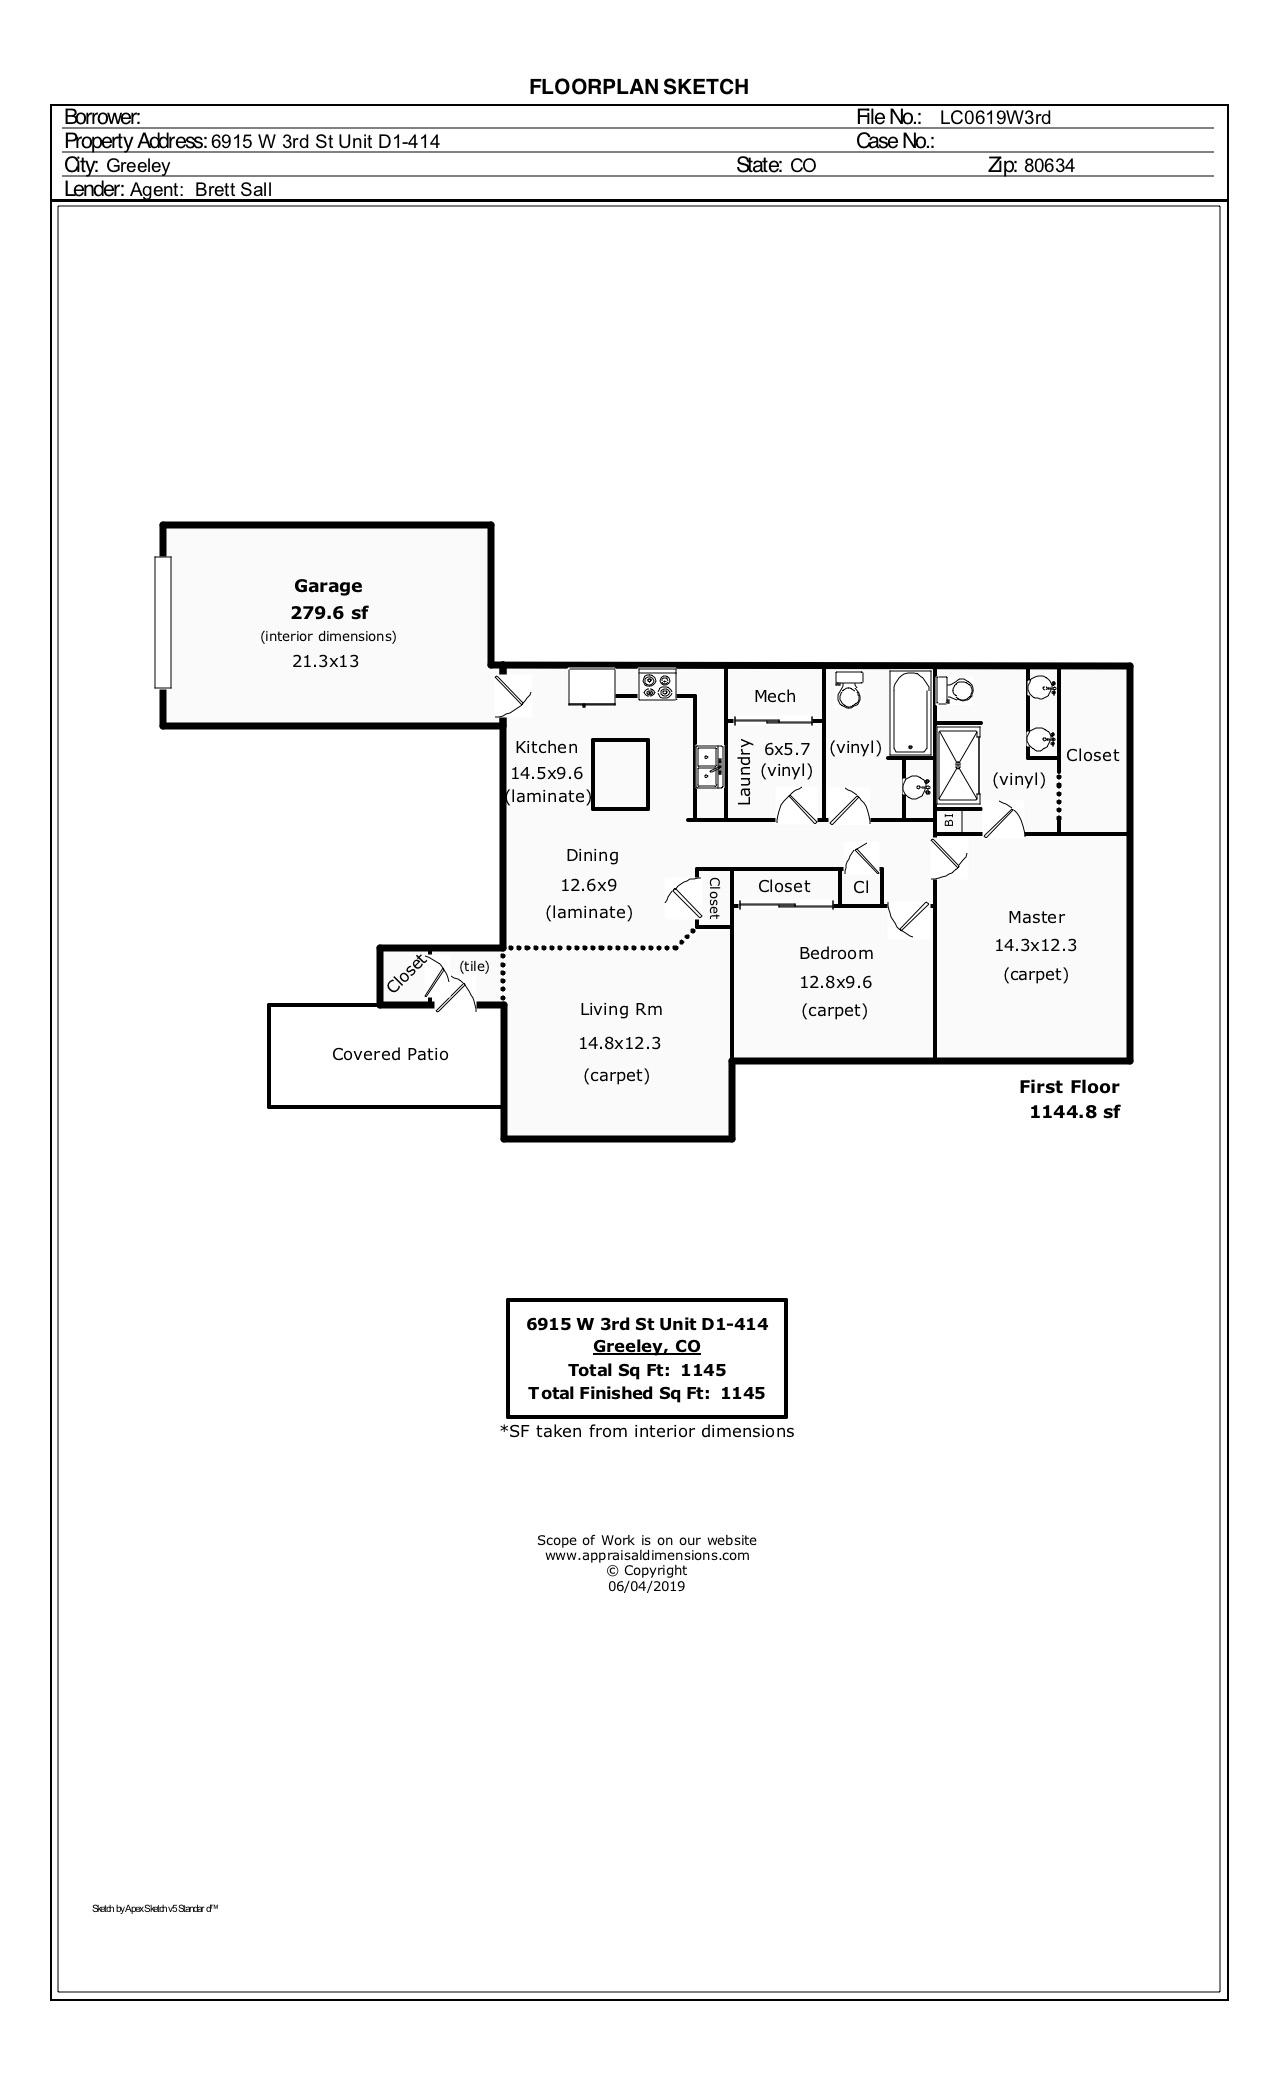 Holley Floor Plan 6915 W 3rd St Unit D1-414.jpg